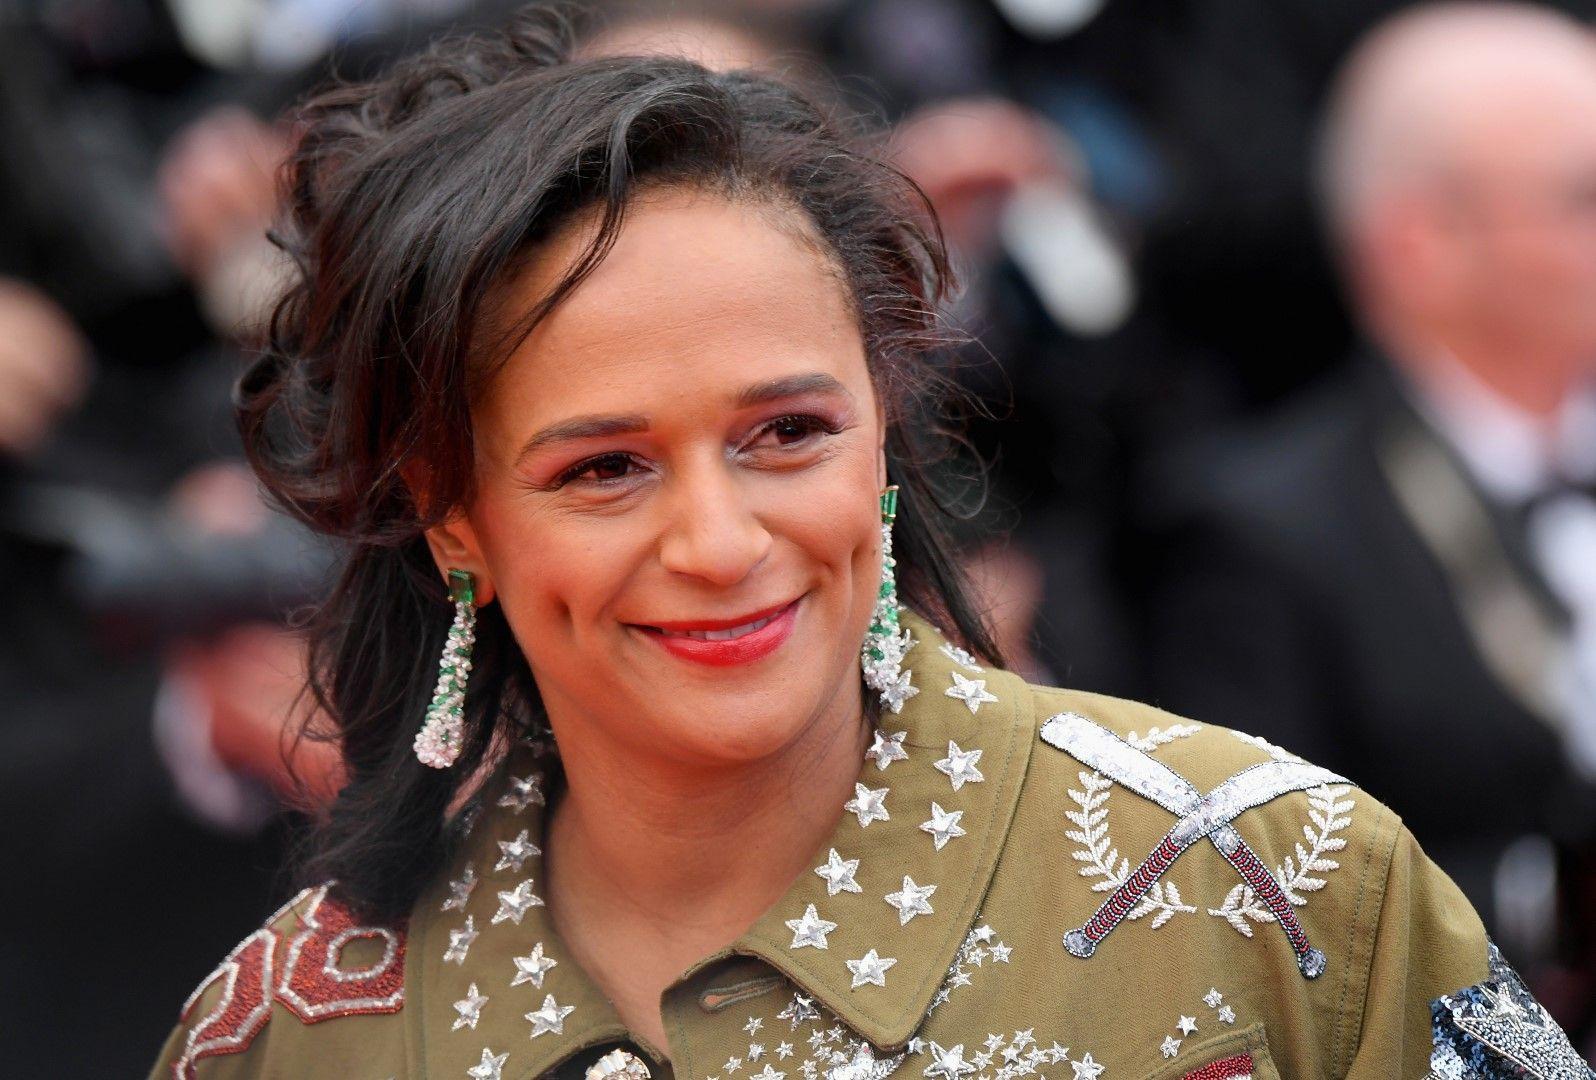 Изабел Душ Сантуш ба кинофестивала в Кан, 14 май 2018 г.